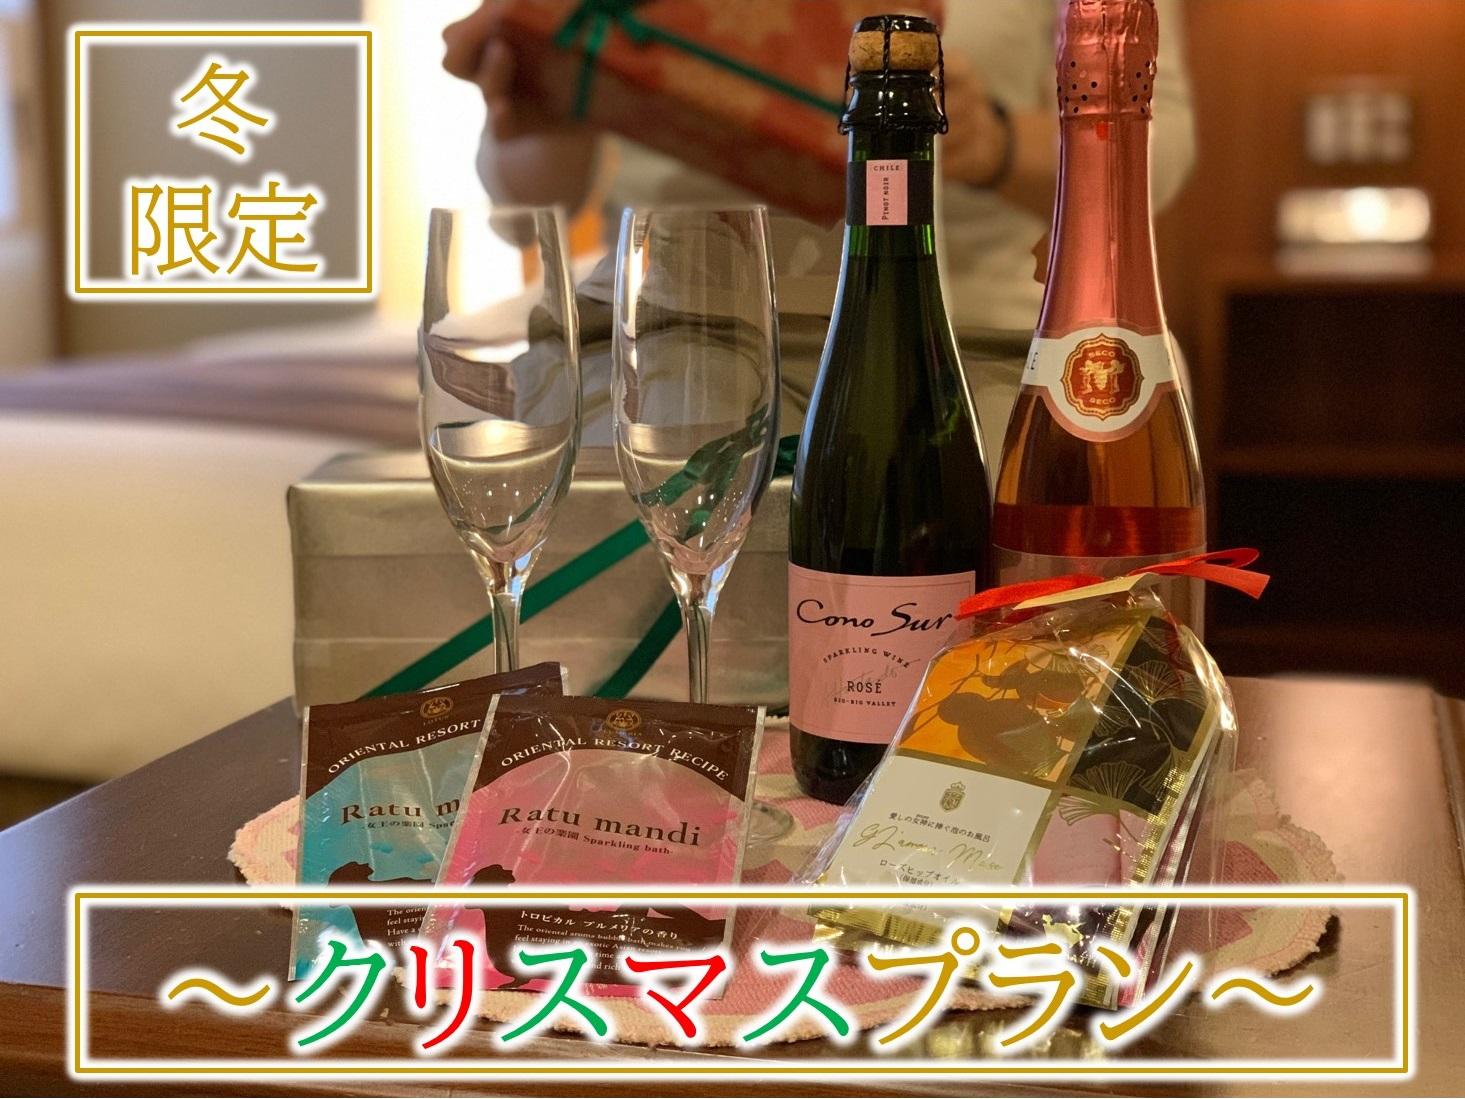 <GoToトラベルキャンペーン割引対象>【冬限定】スパークリングワイン&泡風呂で楽しむクリスマスプラン